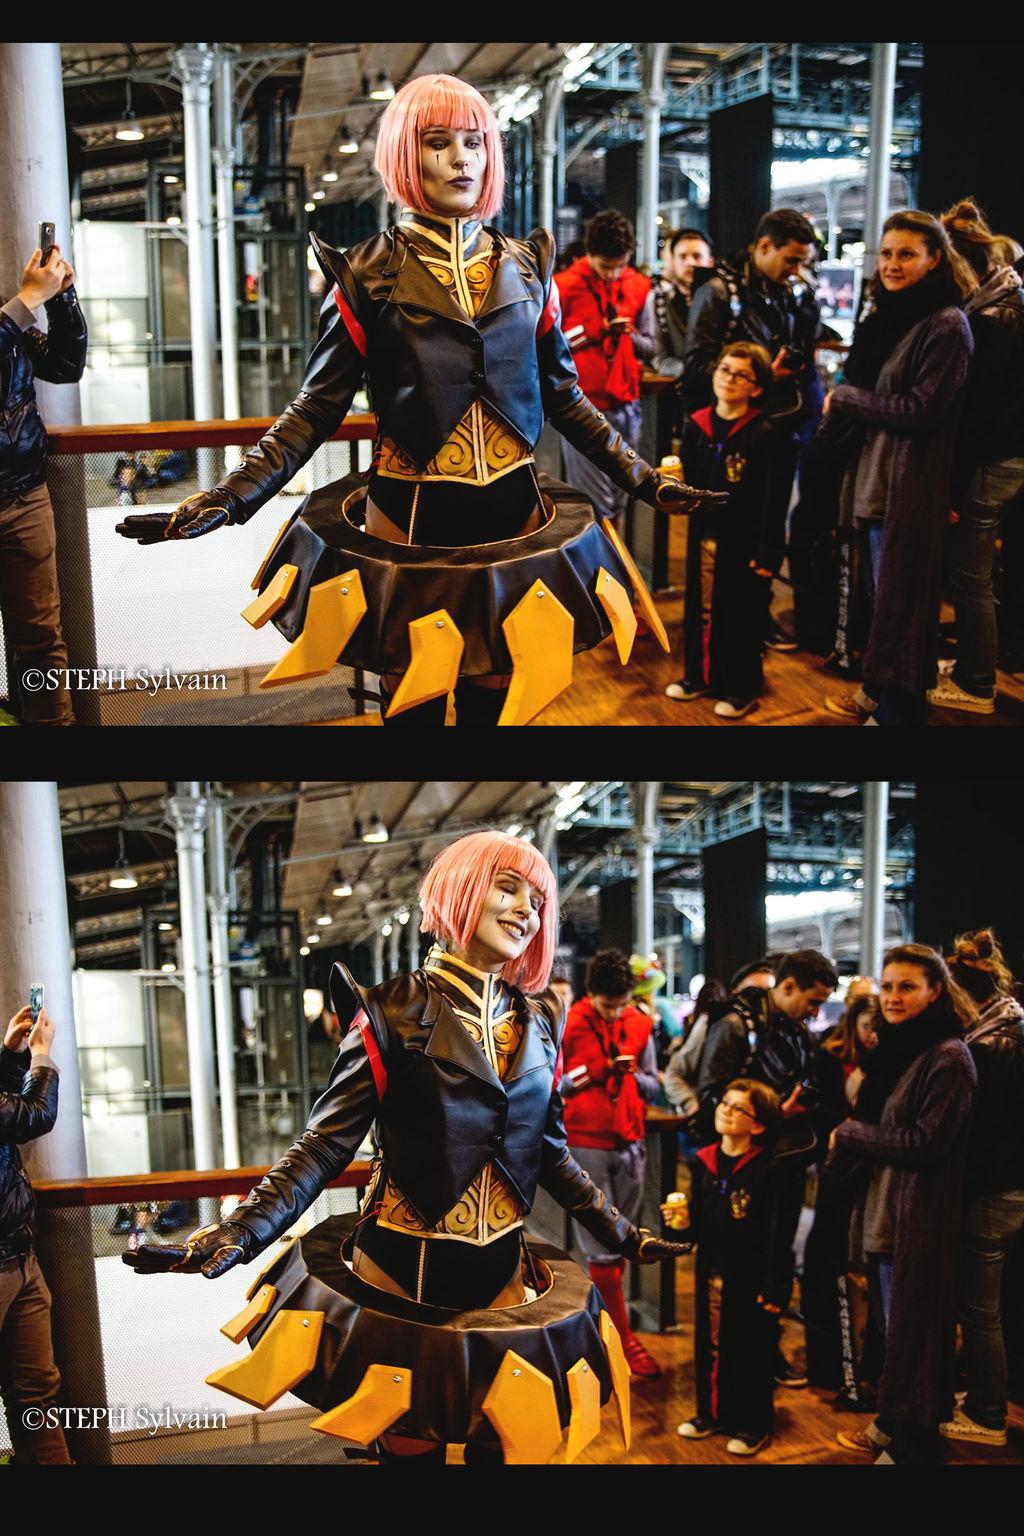 Orianna Bladecraft cosplay